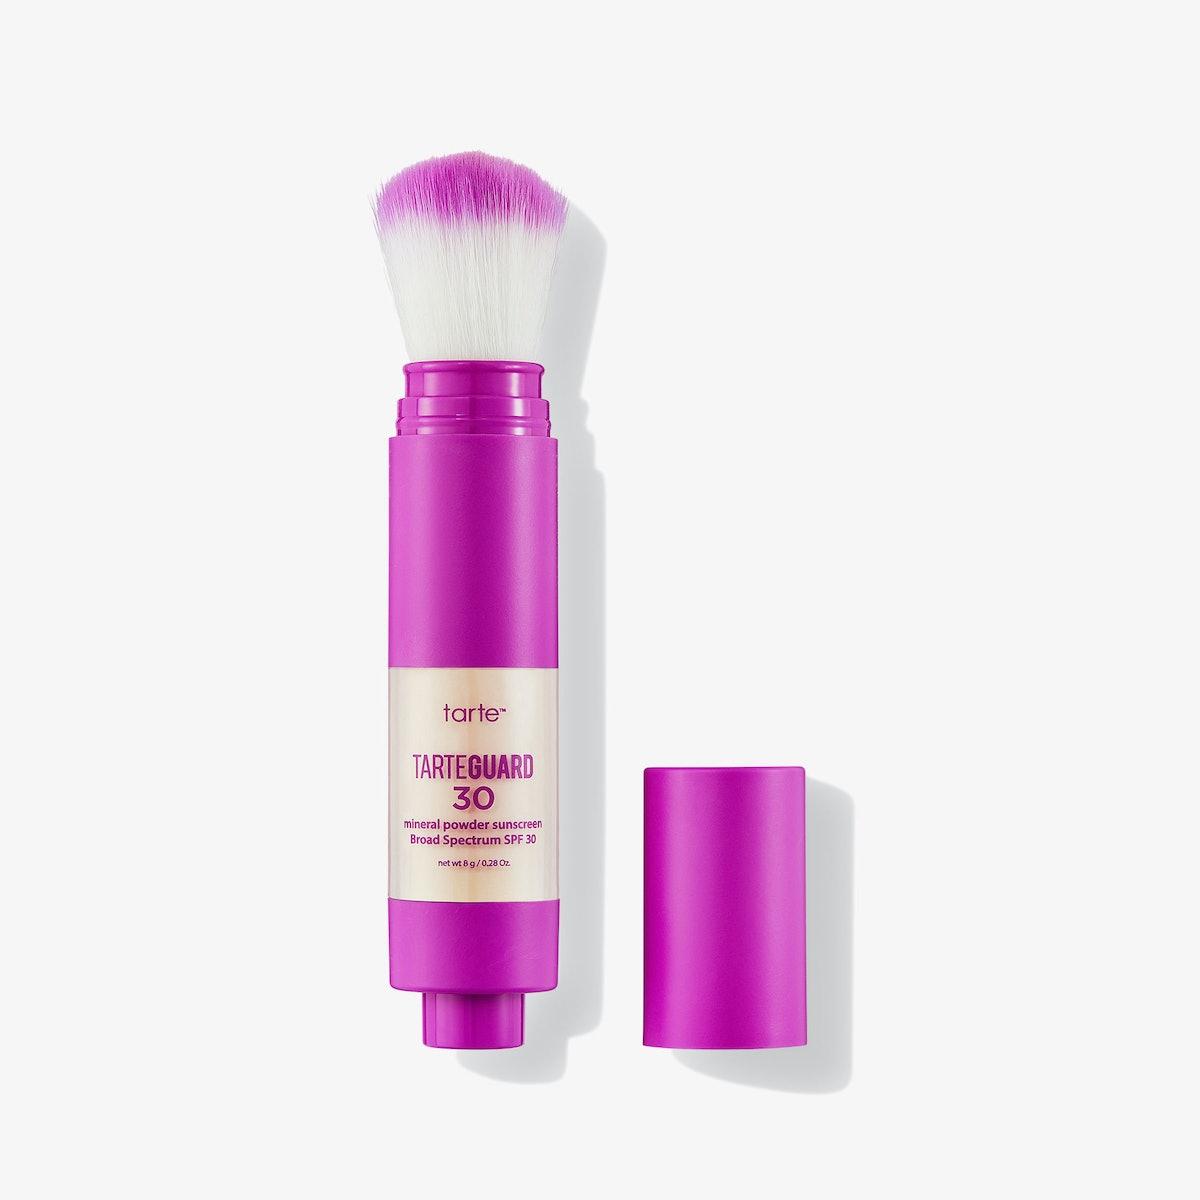 powder sunscreen Broad Spectrum SPF 30